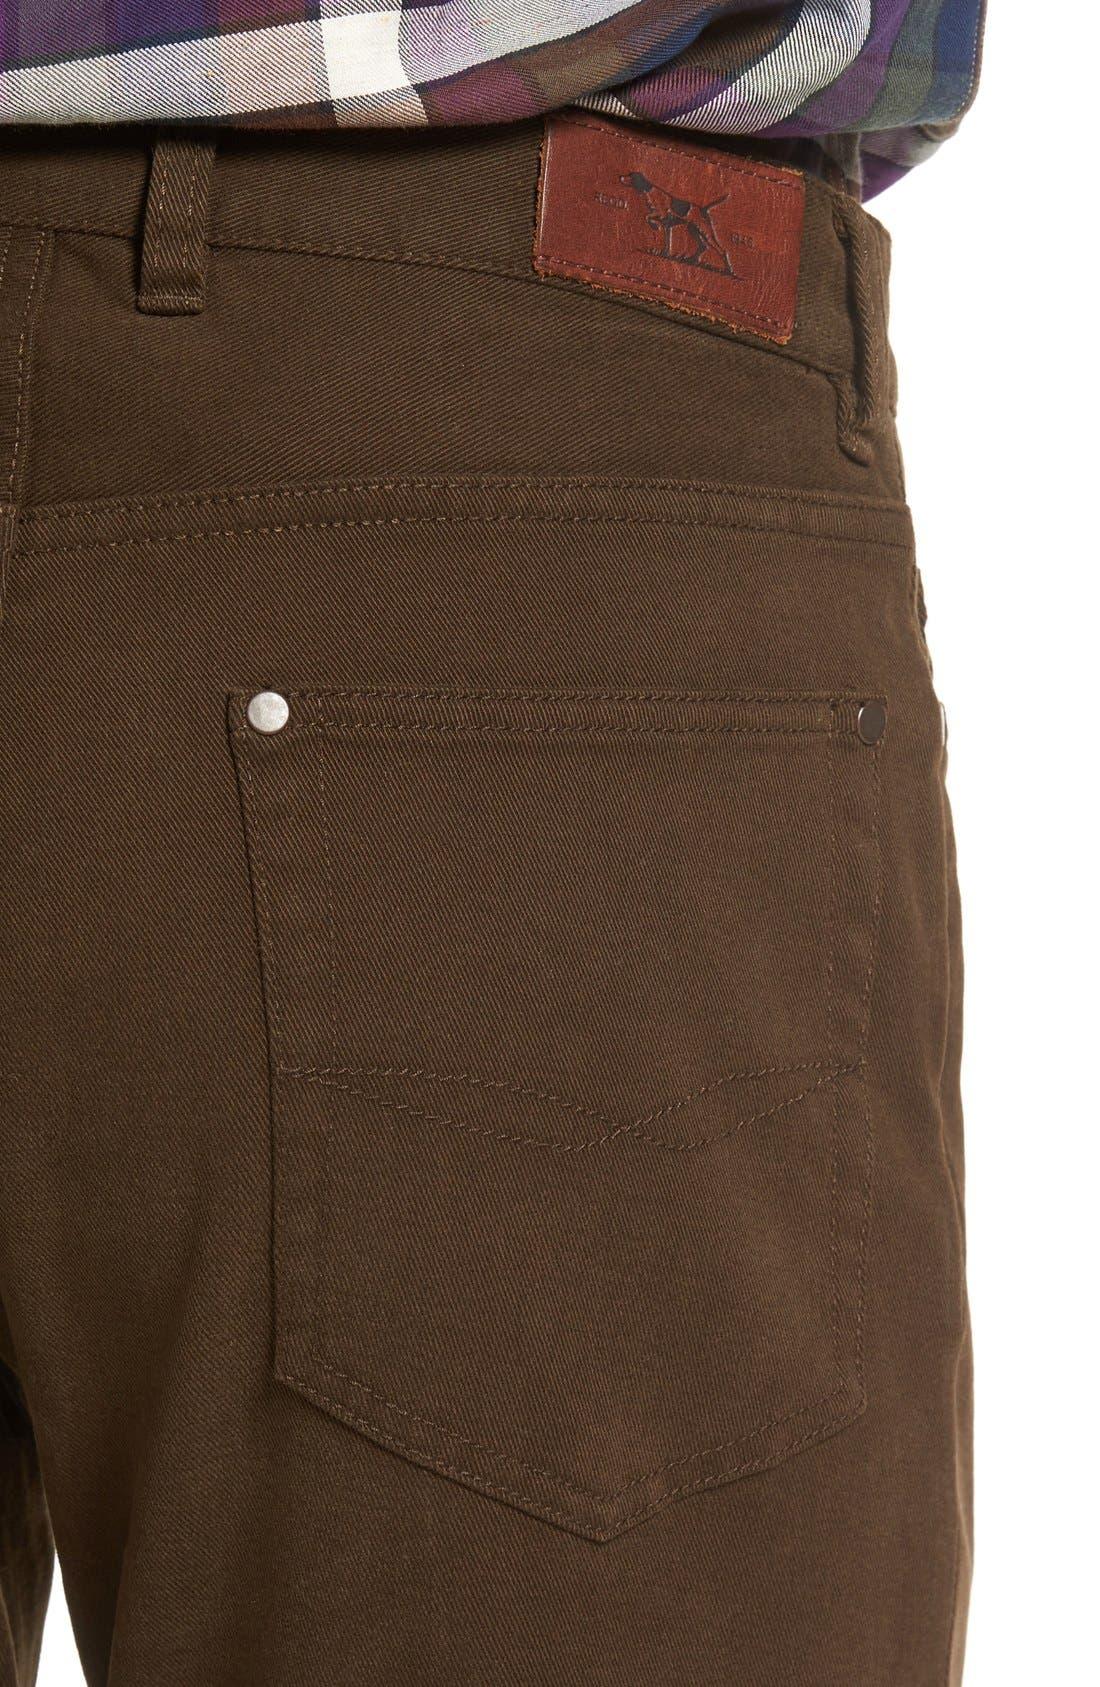 'Barters' Straight Leg Twill Pants,                             Alternate thumbnail 4, color,                             Dark Tobacco